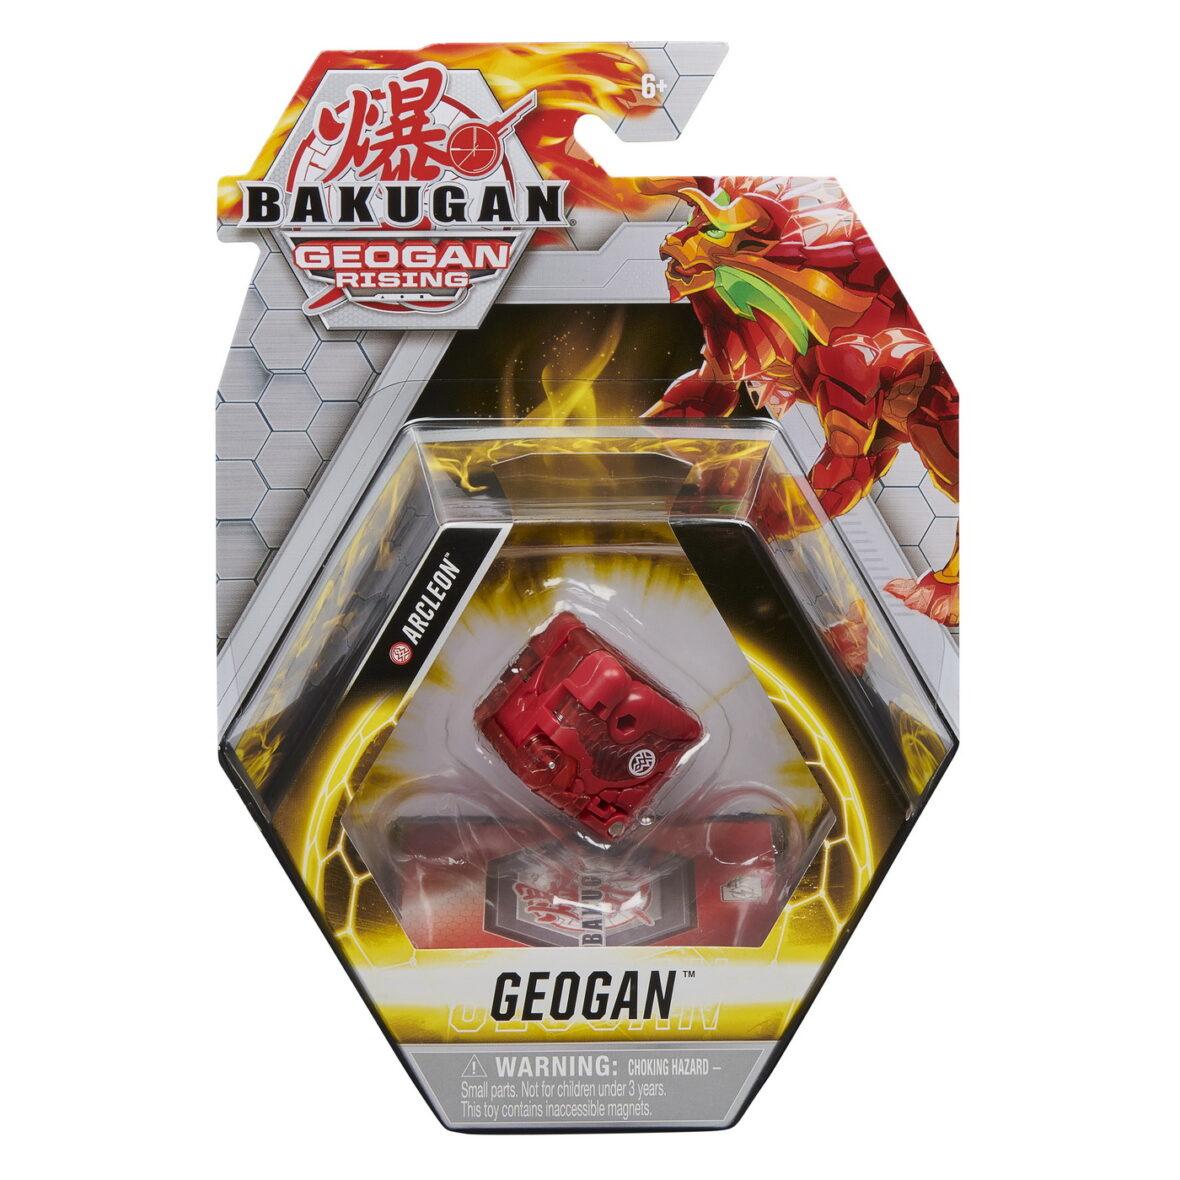 Bakugan S3 Geogan Arcleon